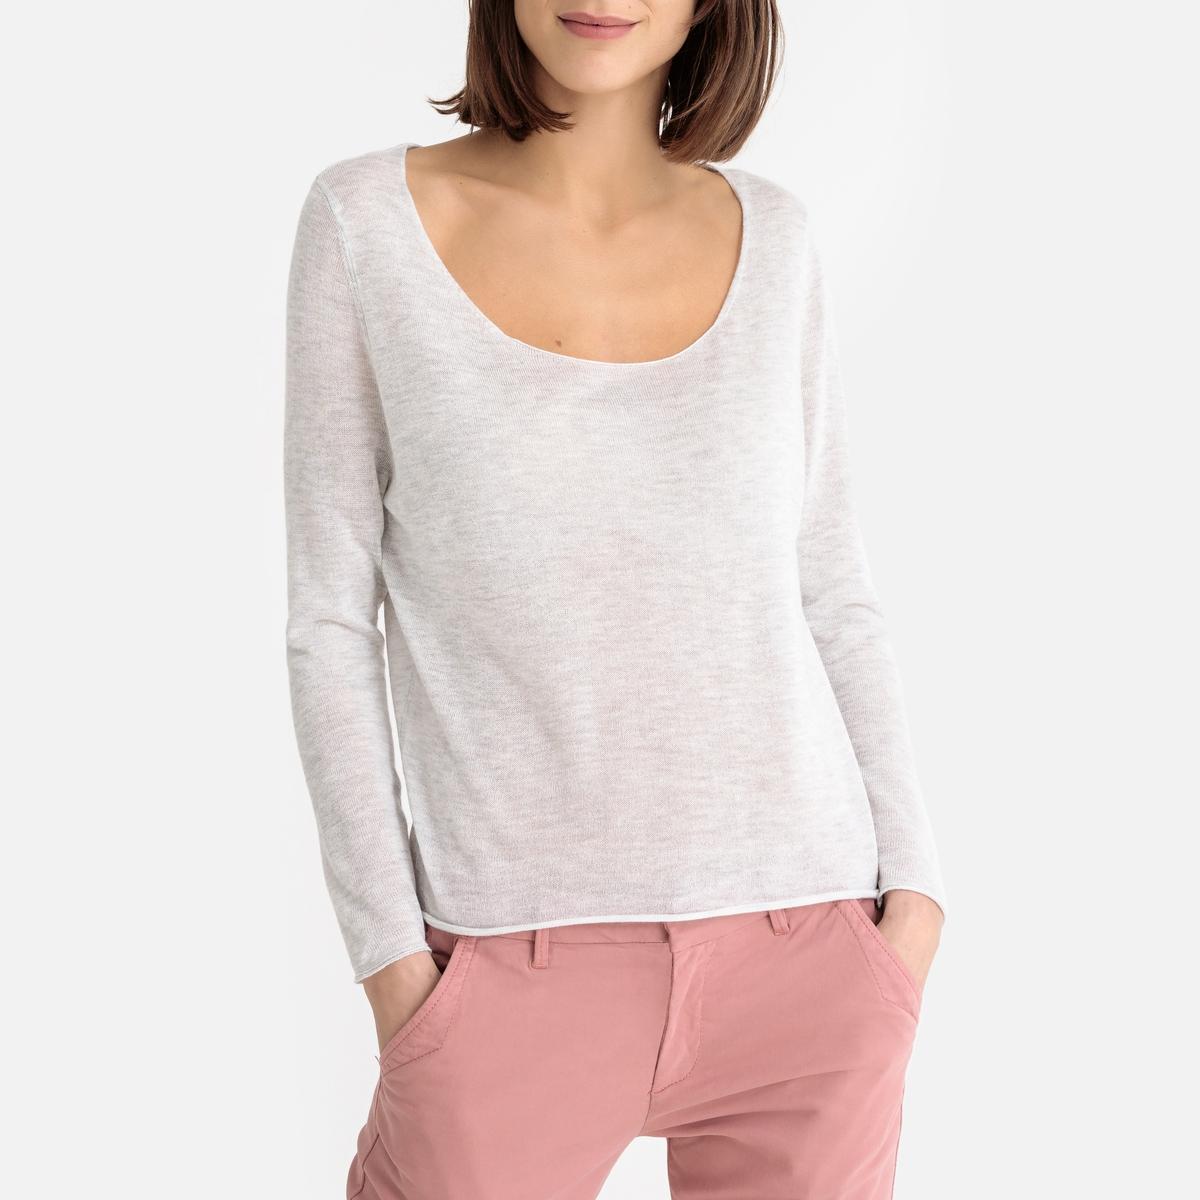 Пуловер La Redoute С вырезом-лодочкой из тонкого трикотажа SPIKBOO M серый пуловер la redoute с вырезом лодочкой из тонкого трикотажа m красный